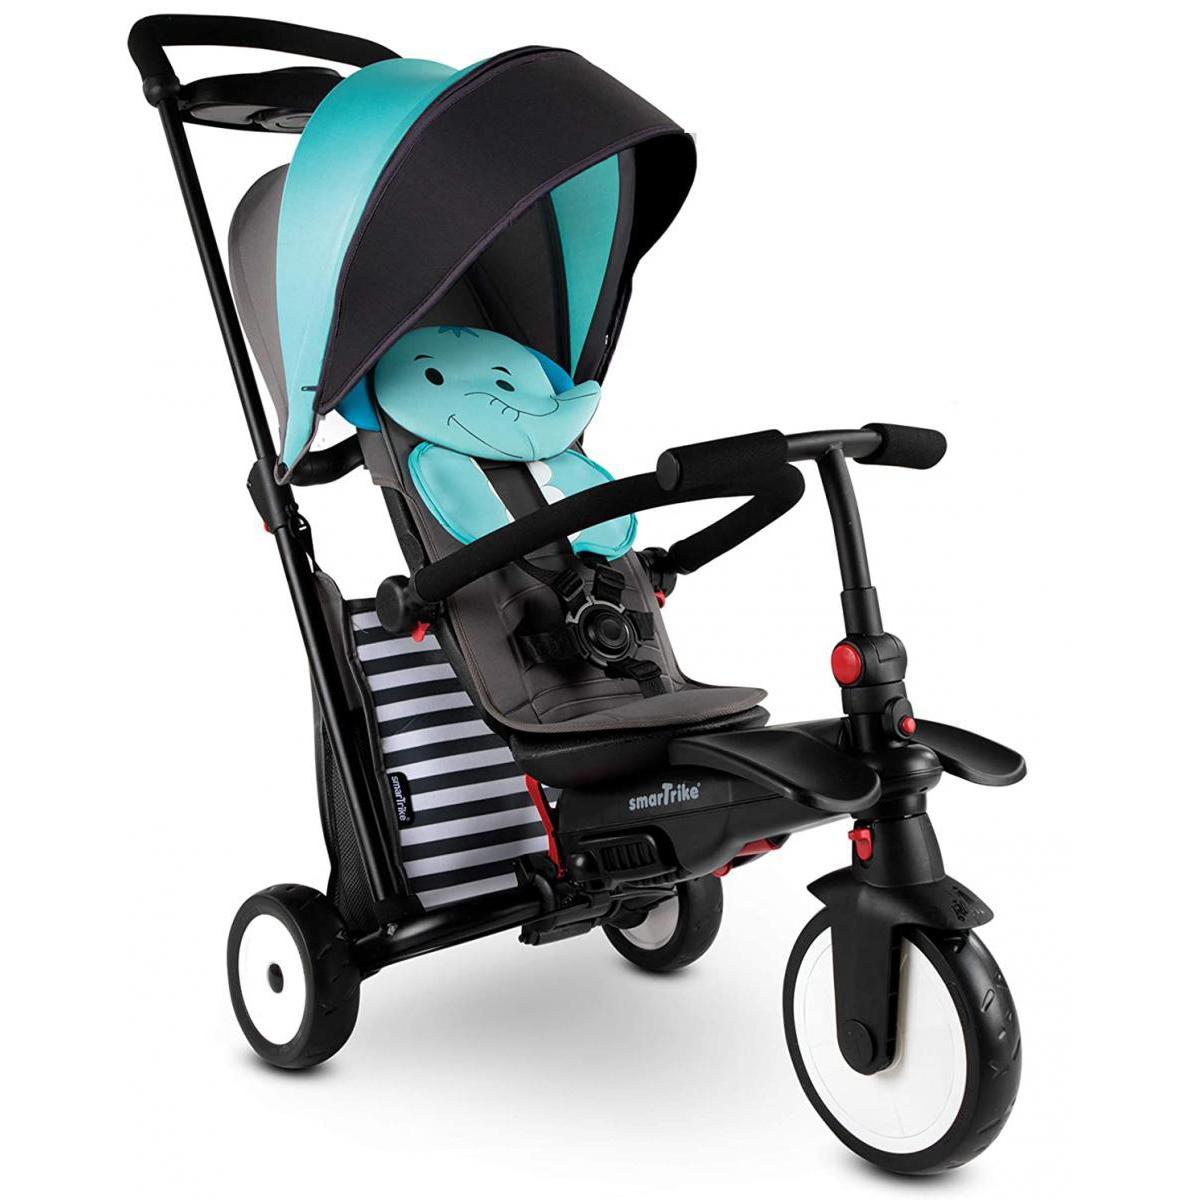 Smart Trike Smartrike Trike Evolutif Pliable STR5 noir/turquoise